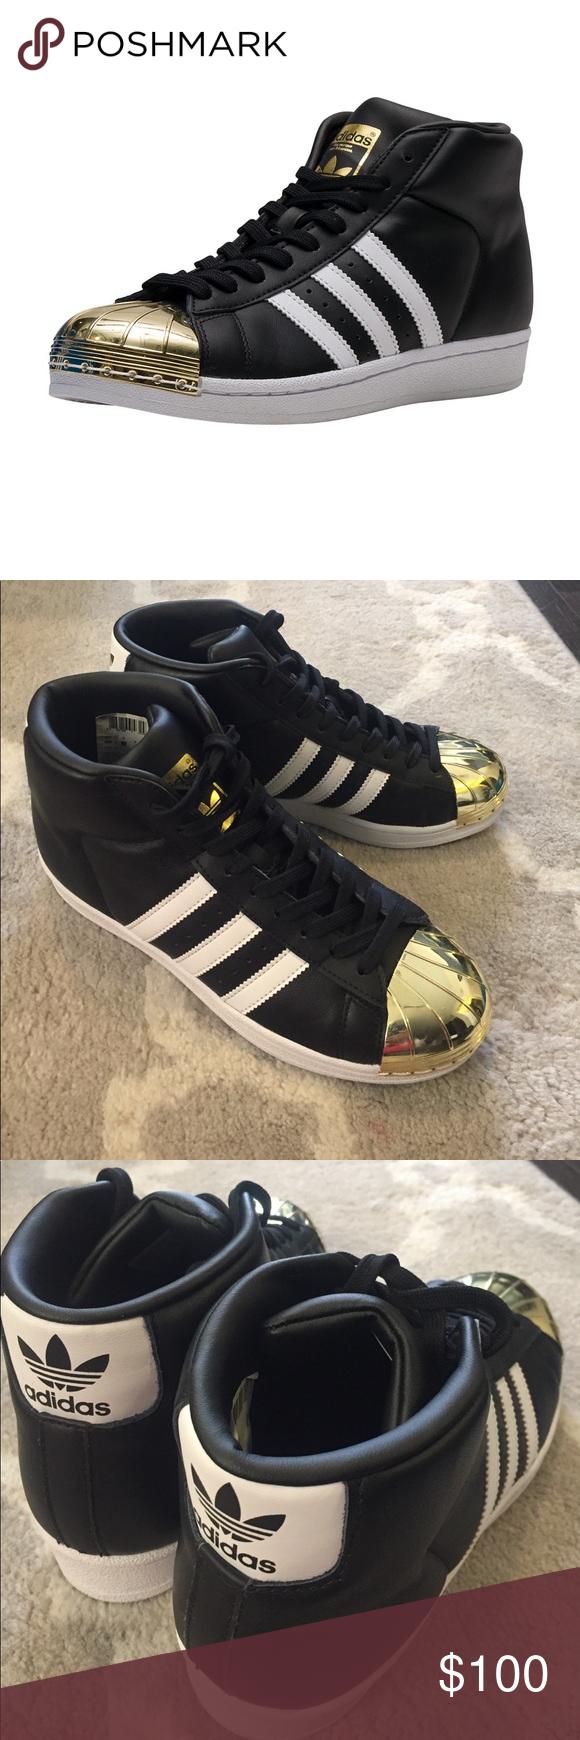 on sale 52727 8c1db Adidas Superstars Pro Model Metal Toe RARE Size 7 STYLE#: BB2130 RARE GOLD  METALLIC